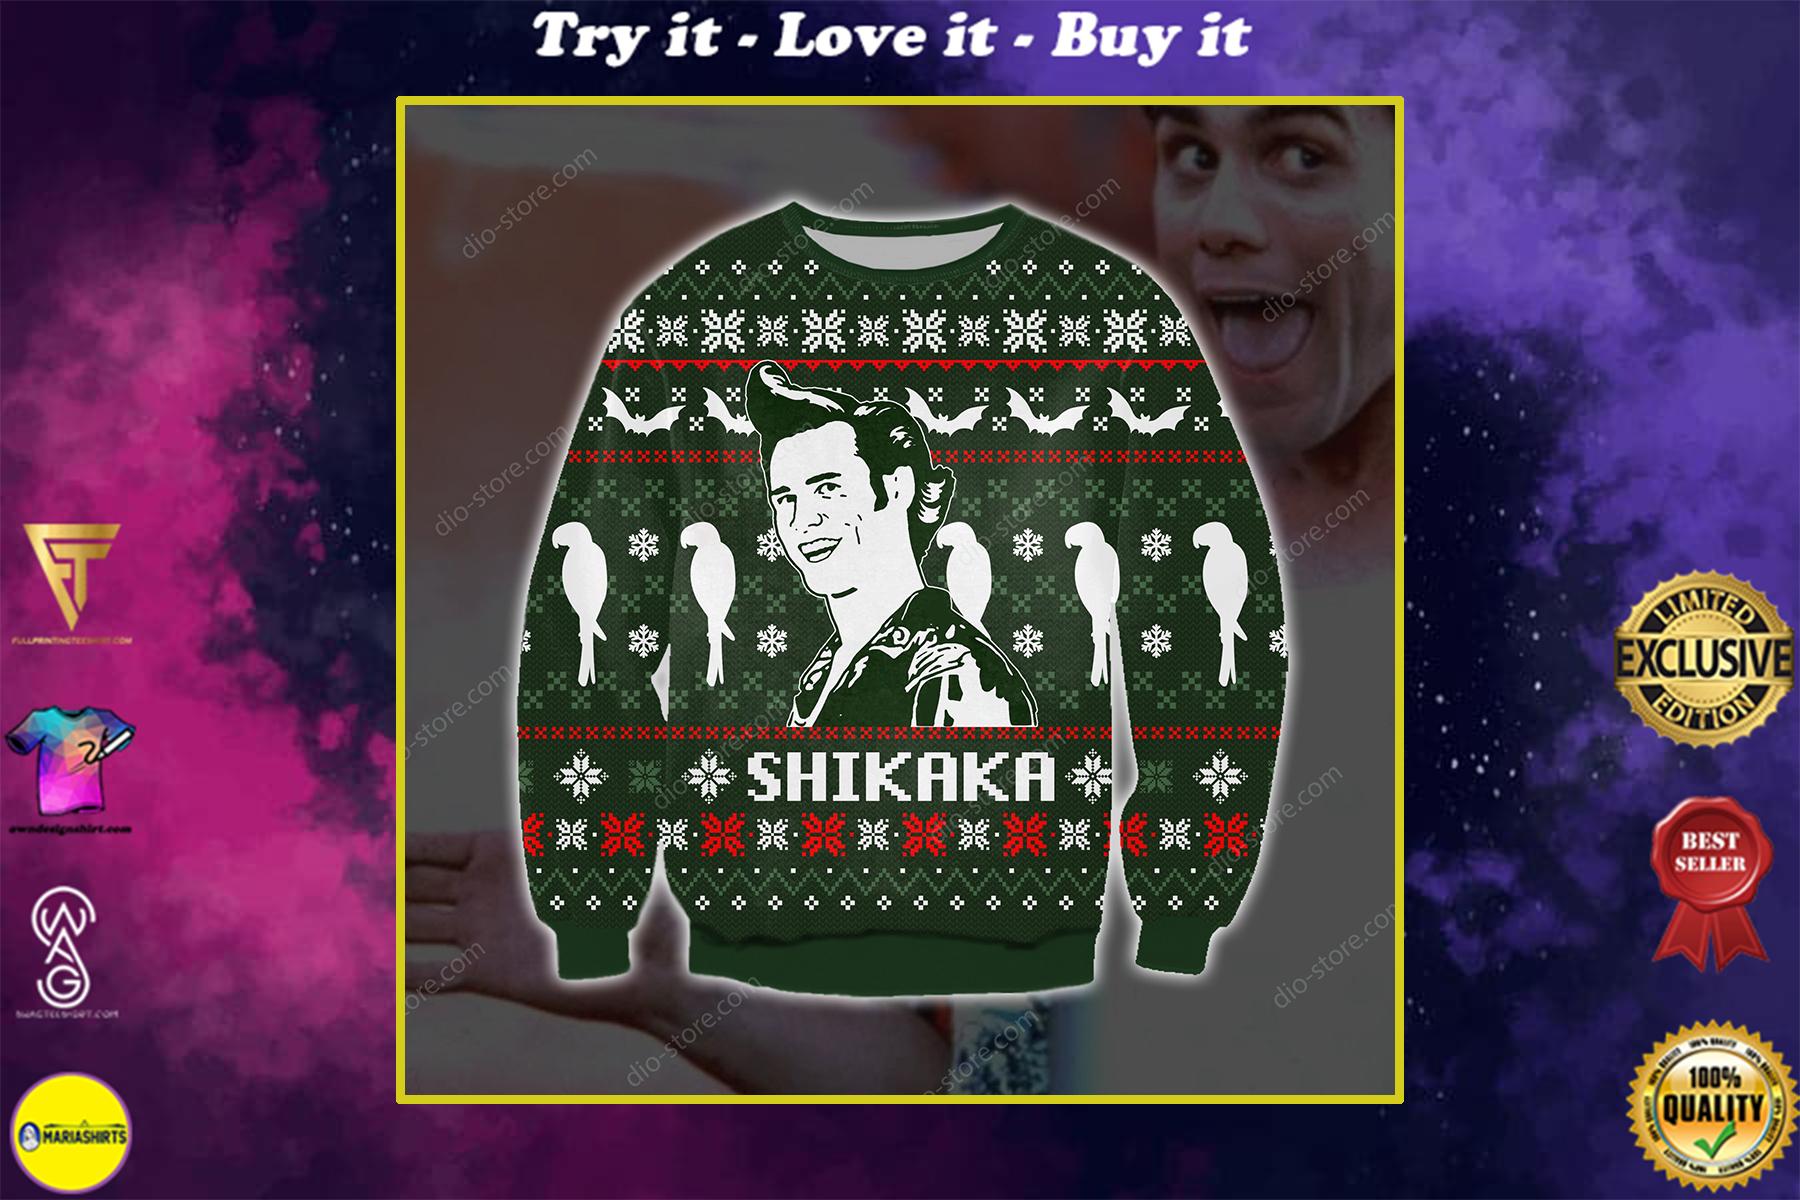 ace ventura shikaka all over printed ugly christmas sweater